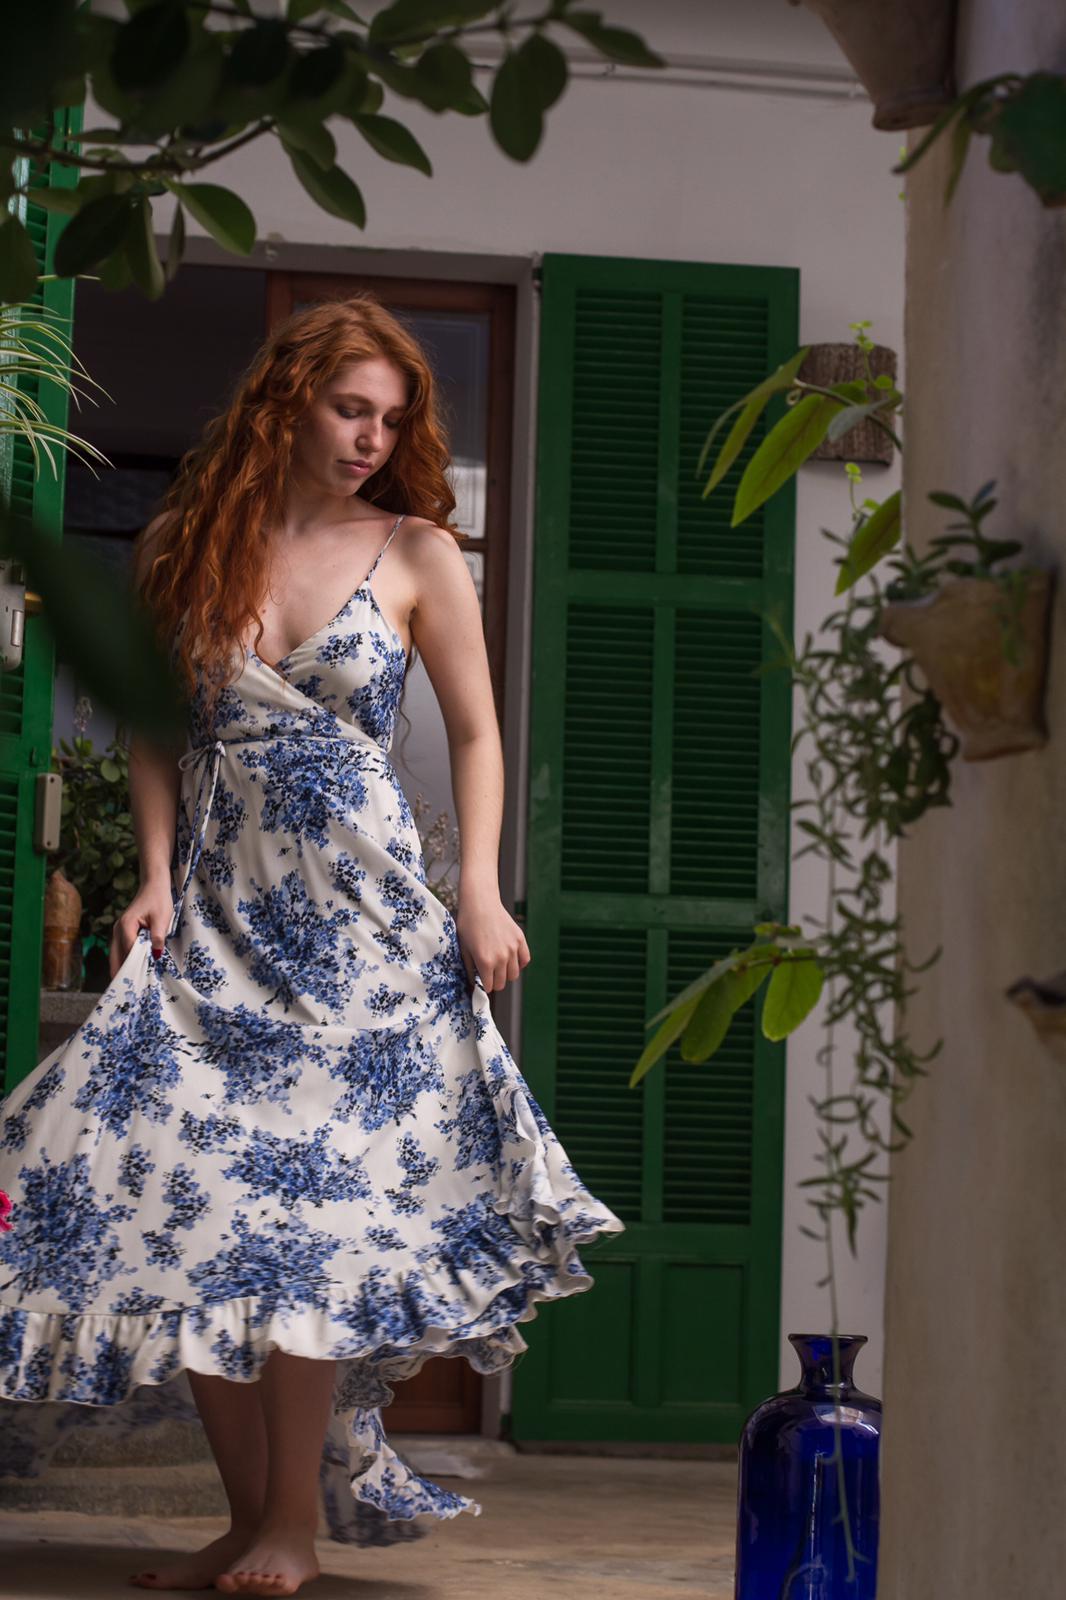 carolina.albertoni.mallorca.handmade.dresses.soft.sensual.feminity.designer.feminine